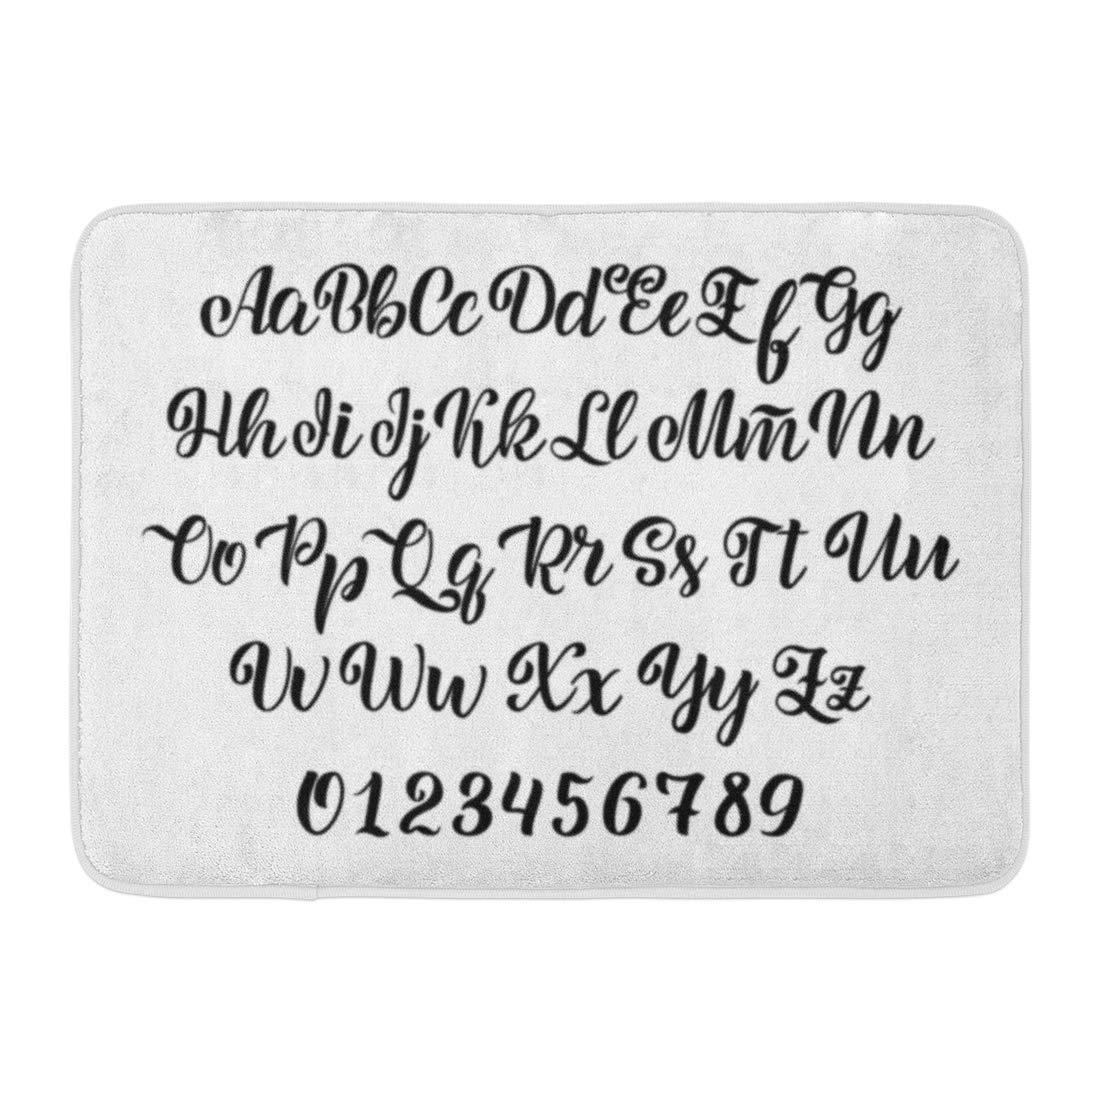 Godpok Abc Black Cursive Typeface Brush Letters Handwritten Script Alphabet  White For Your Designs Graphic Rug Doormat Bath Mat 23.6X15.7 Inch -